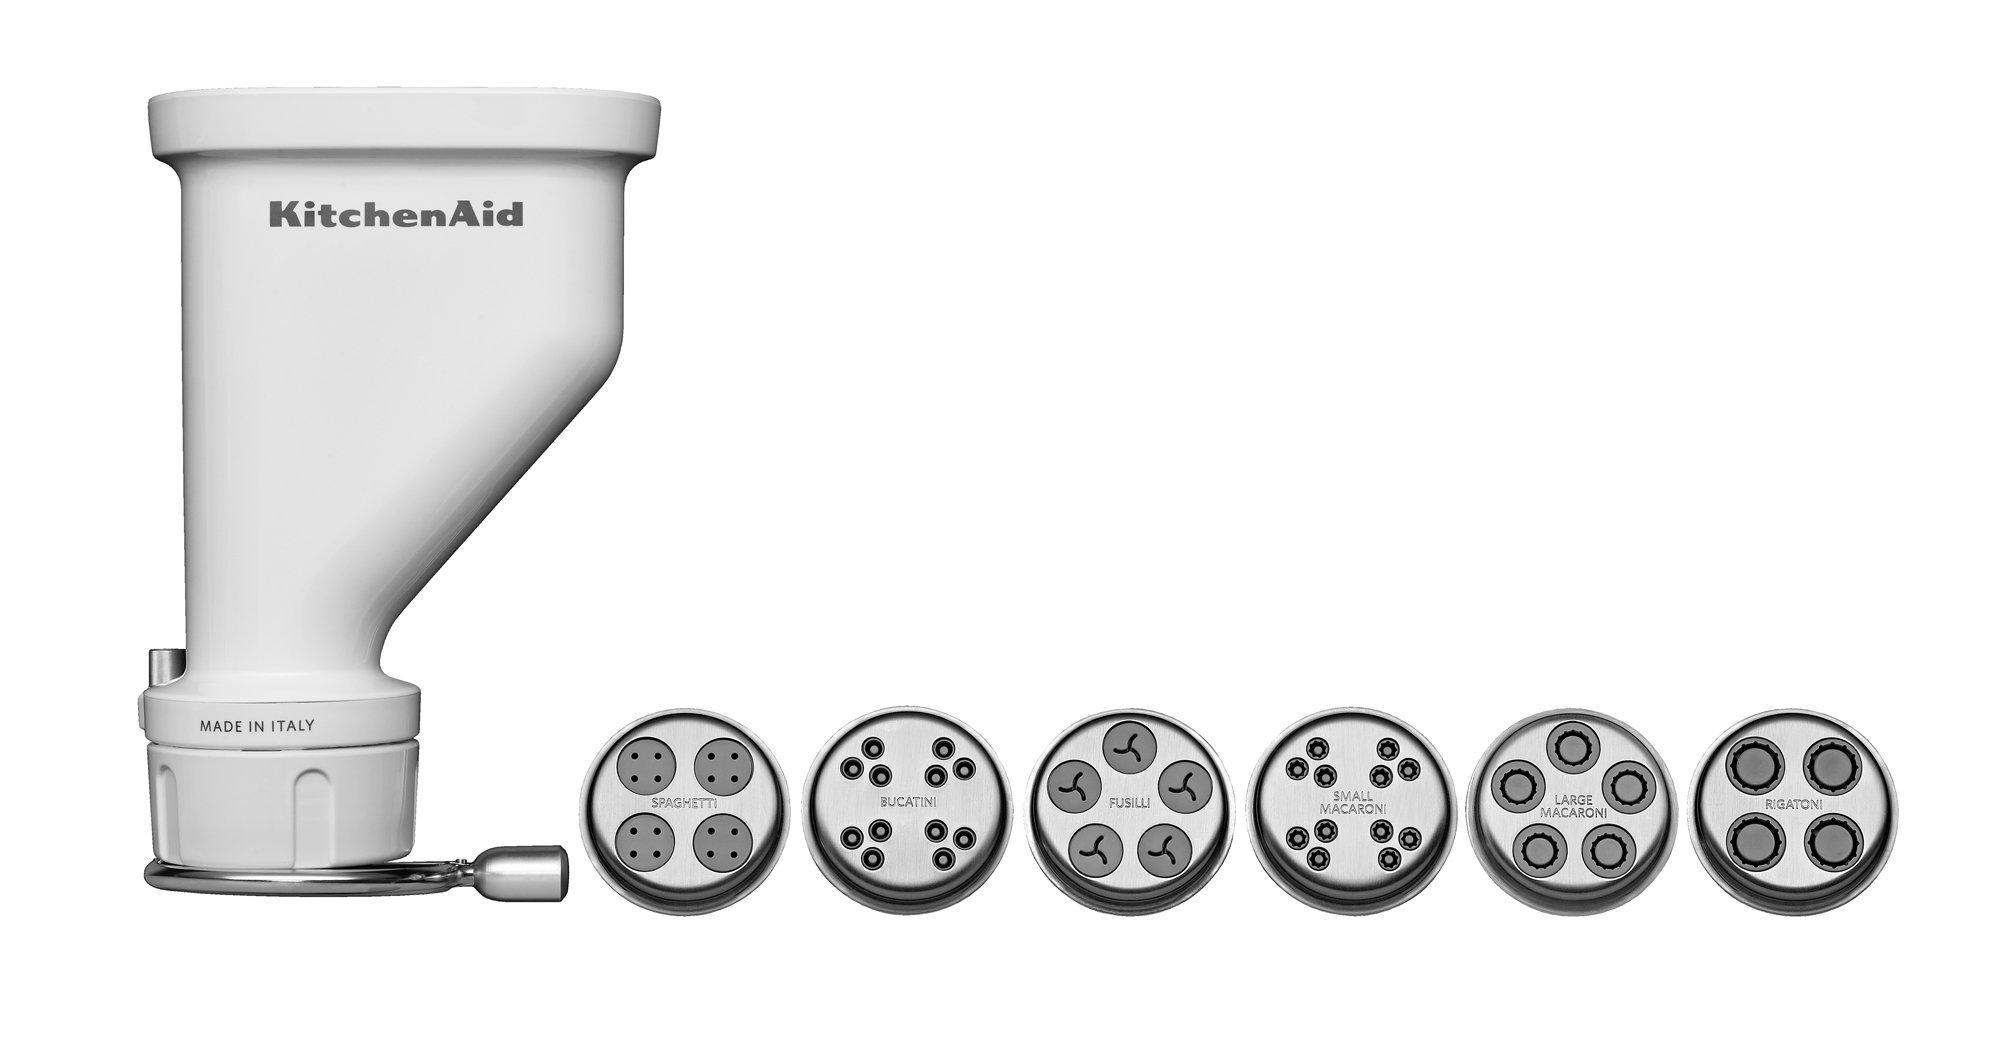 KitchenAid KSMPEXTA Gourmet Pasta Press Attachment with 6 Interchangeable Pasta Plates by KitchenAid (Image #1)